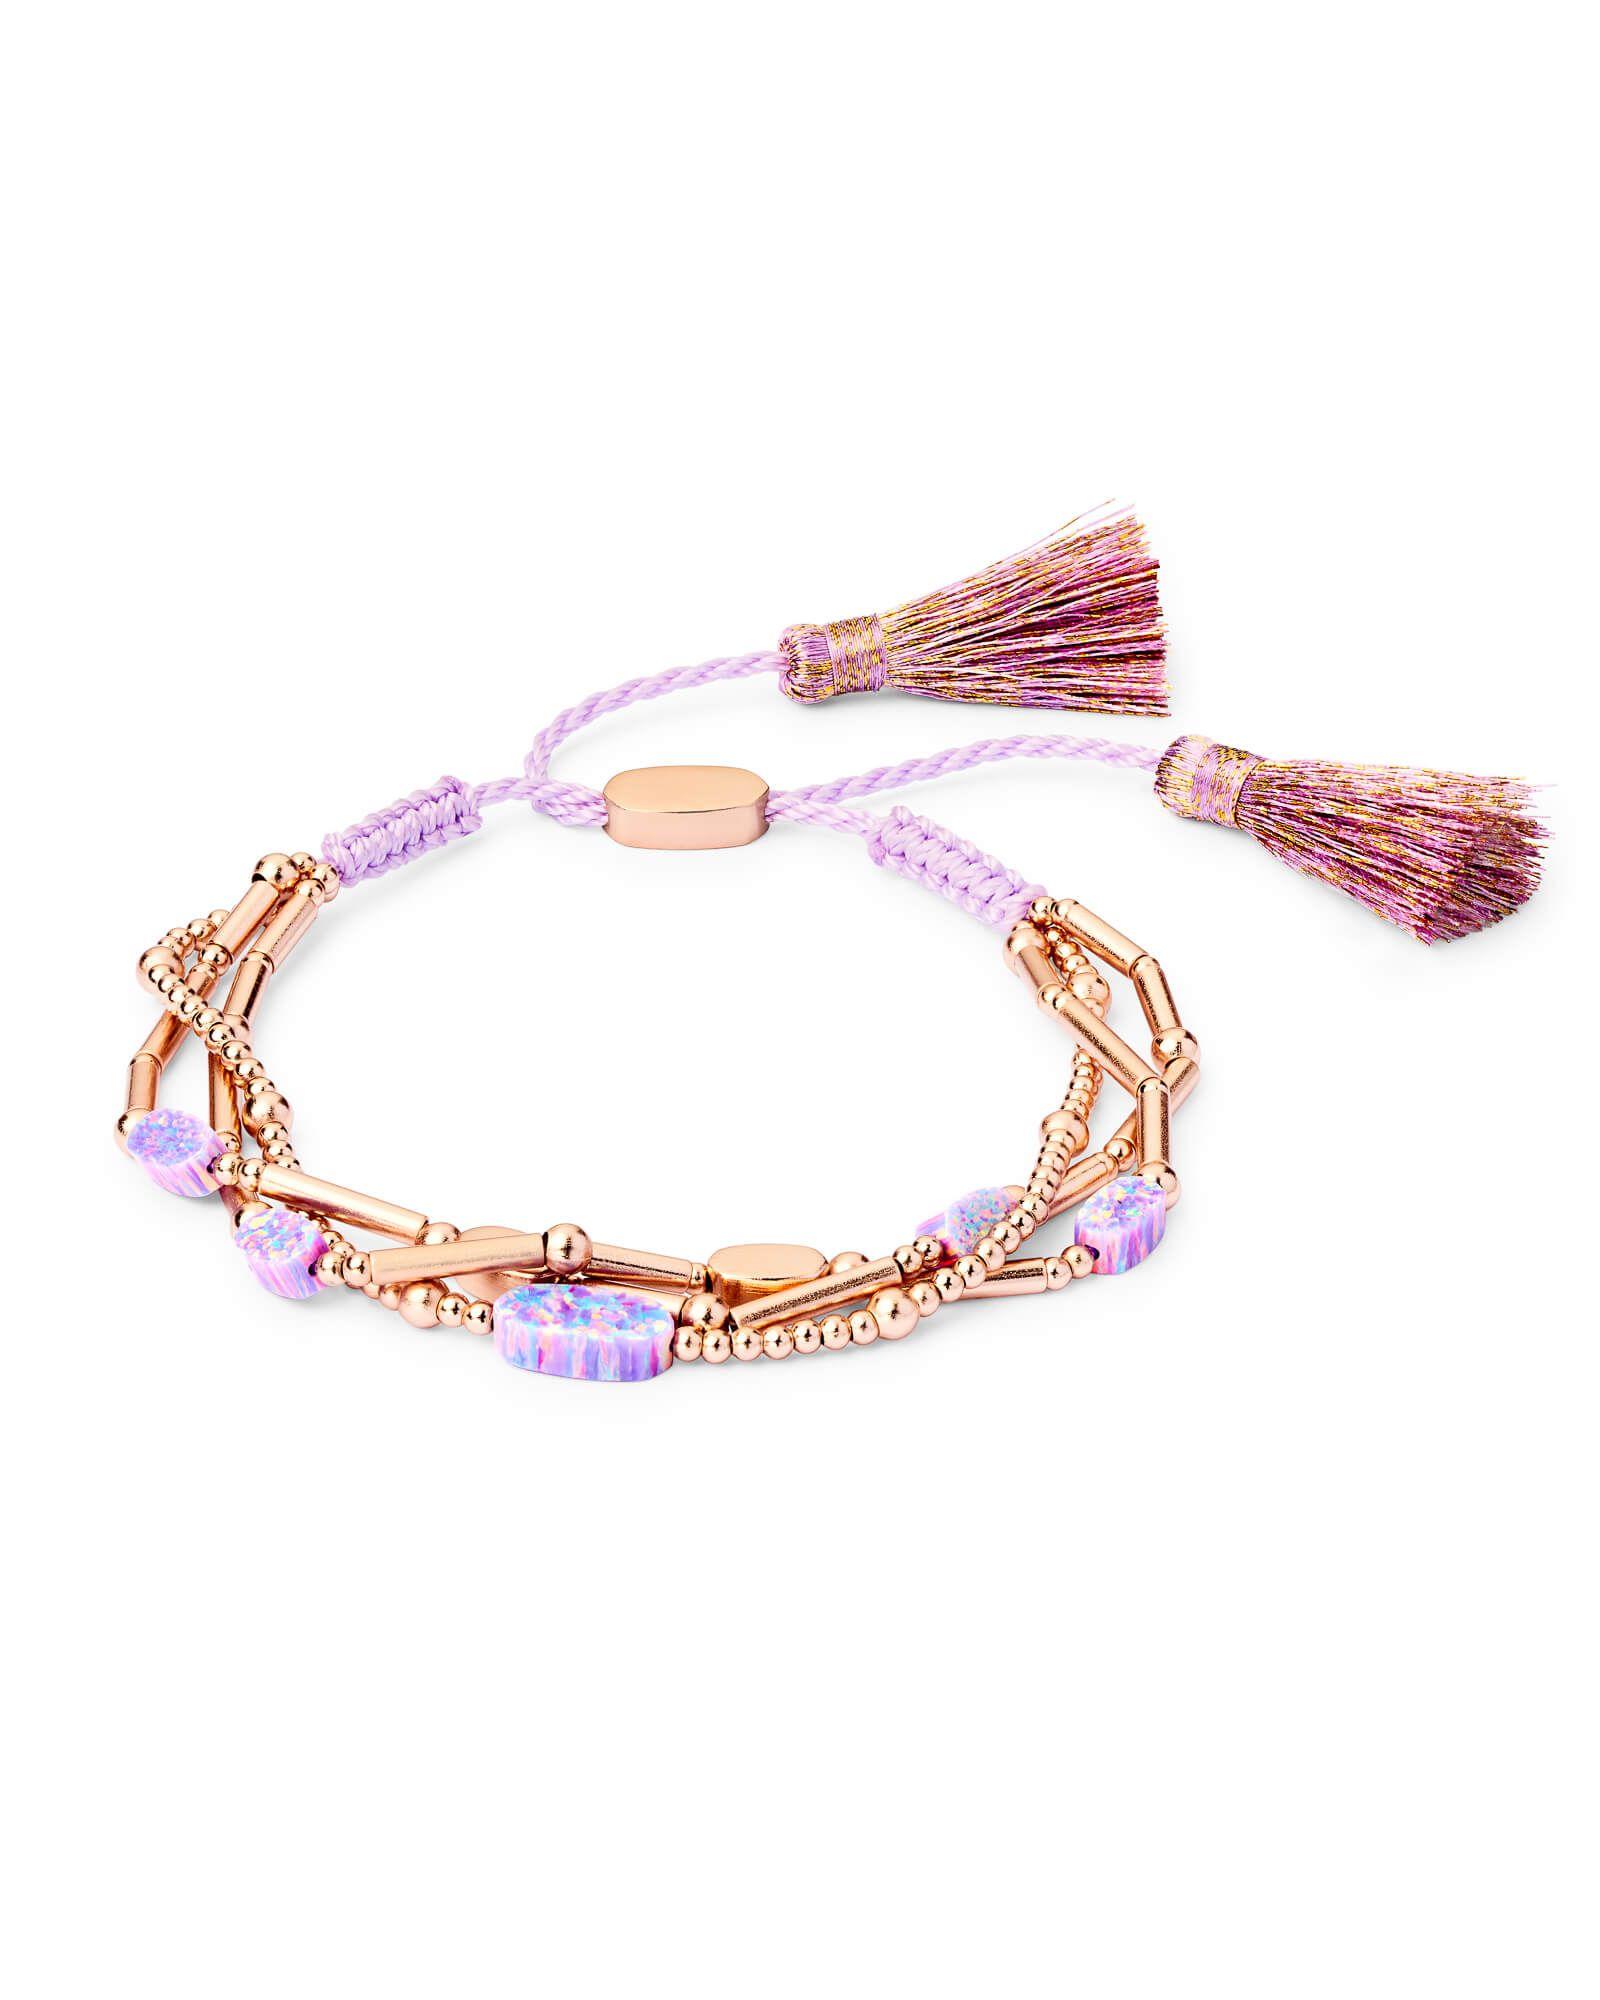 c80de0a3944b6 Chantal Rose Gold Chain Bracelet in Lavender Kyocera Opal | Kendra ...